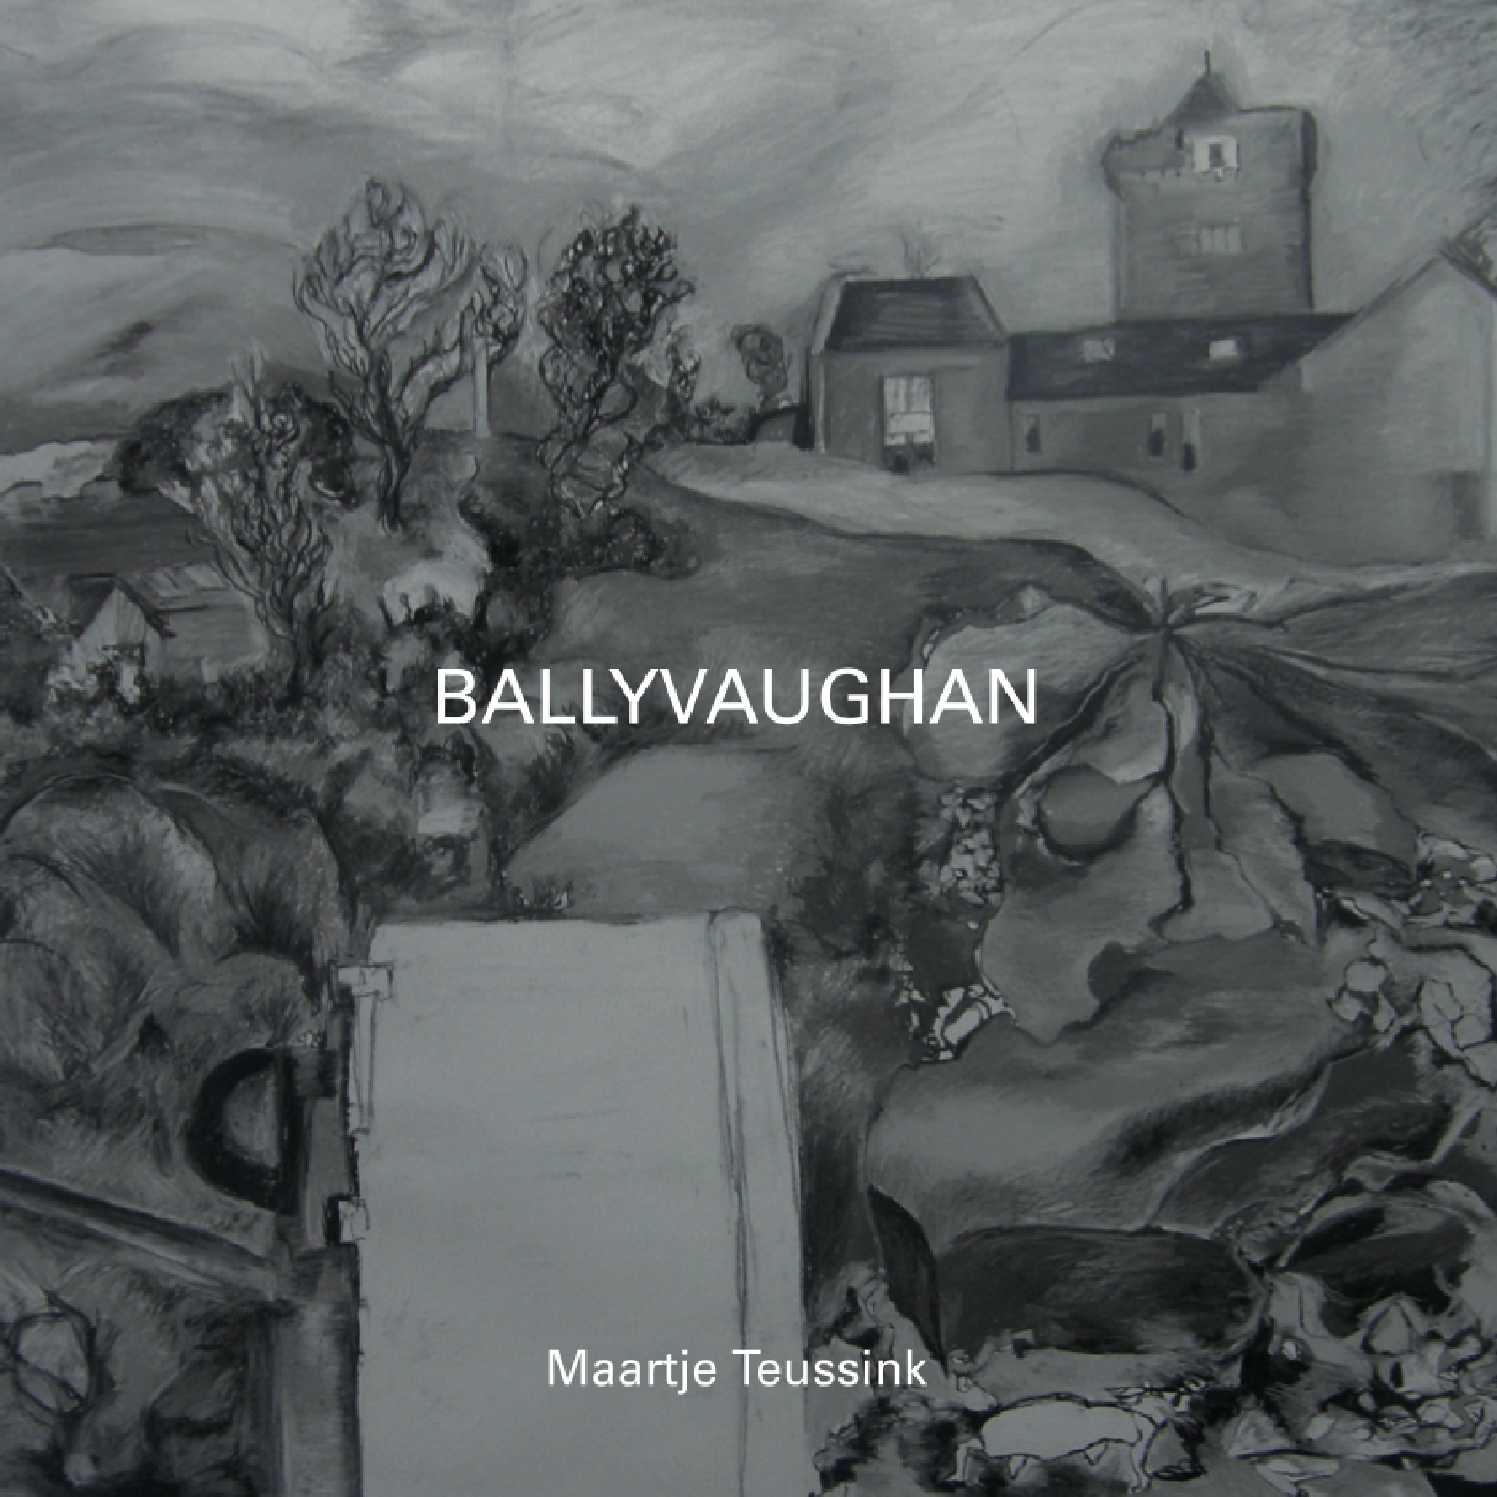 ballyvaughan-maartje-teussink-1500-1509